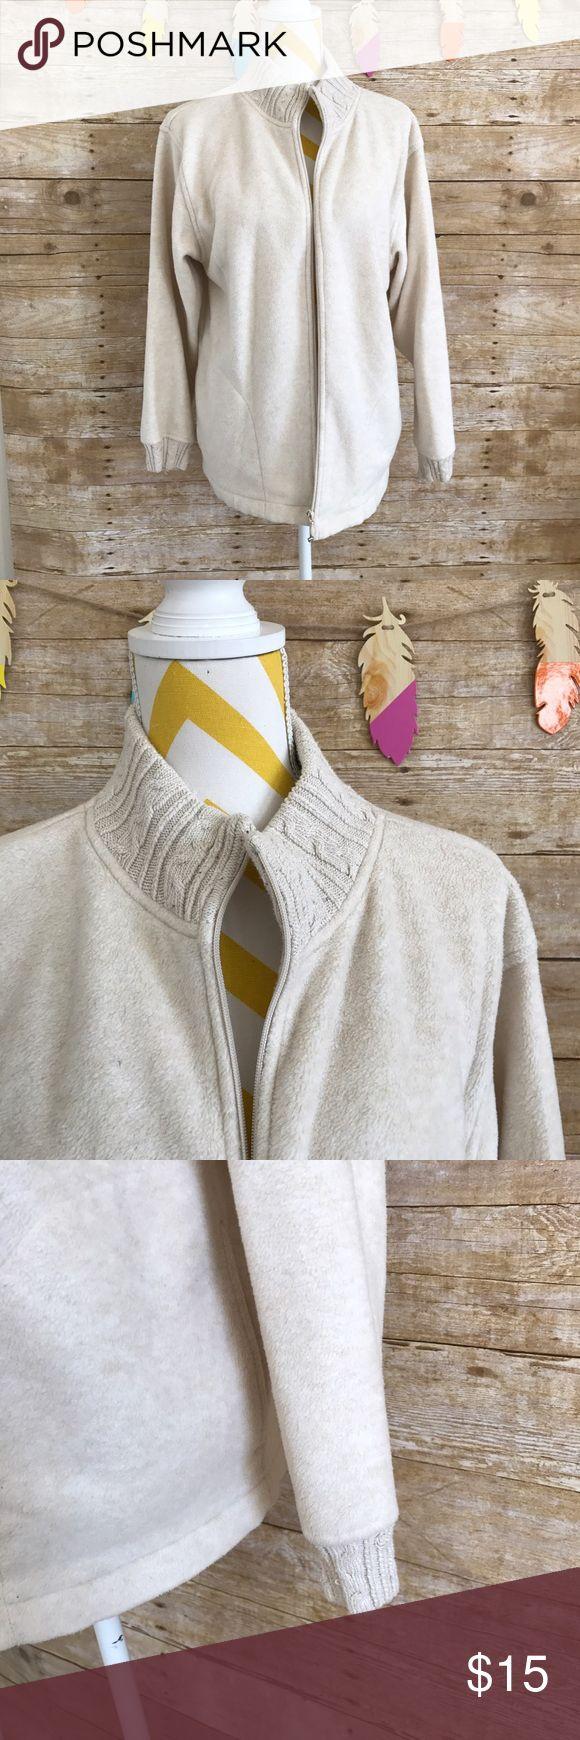 Karen Scott sport cream knitted fleece sweater EUC! 72% polyester 28% rayon, pockets on both side Karen Scott Sweaters Cardigans